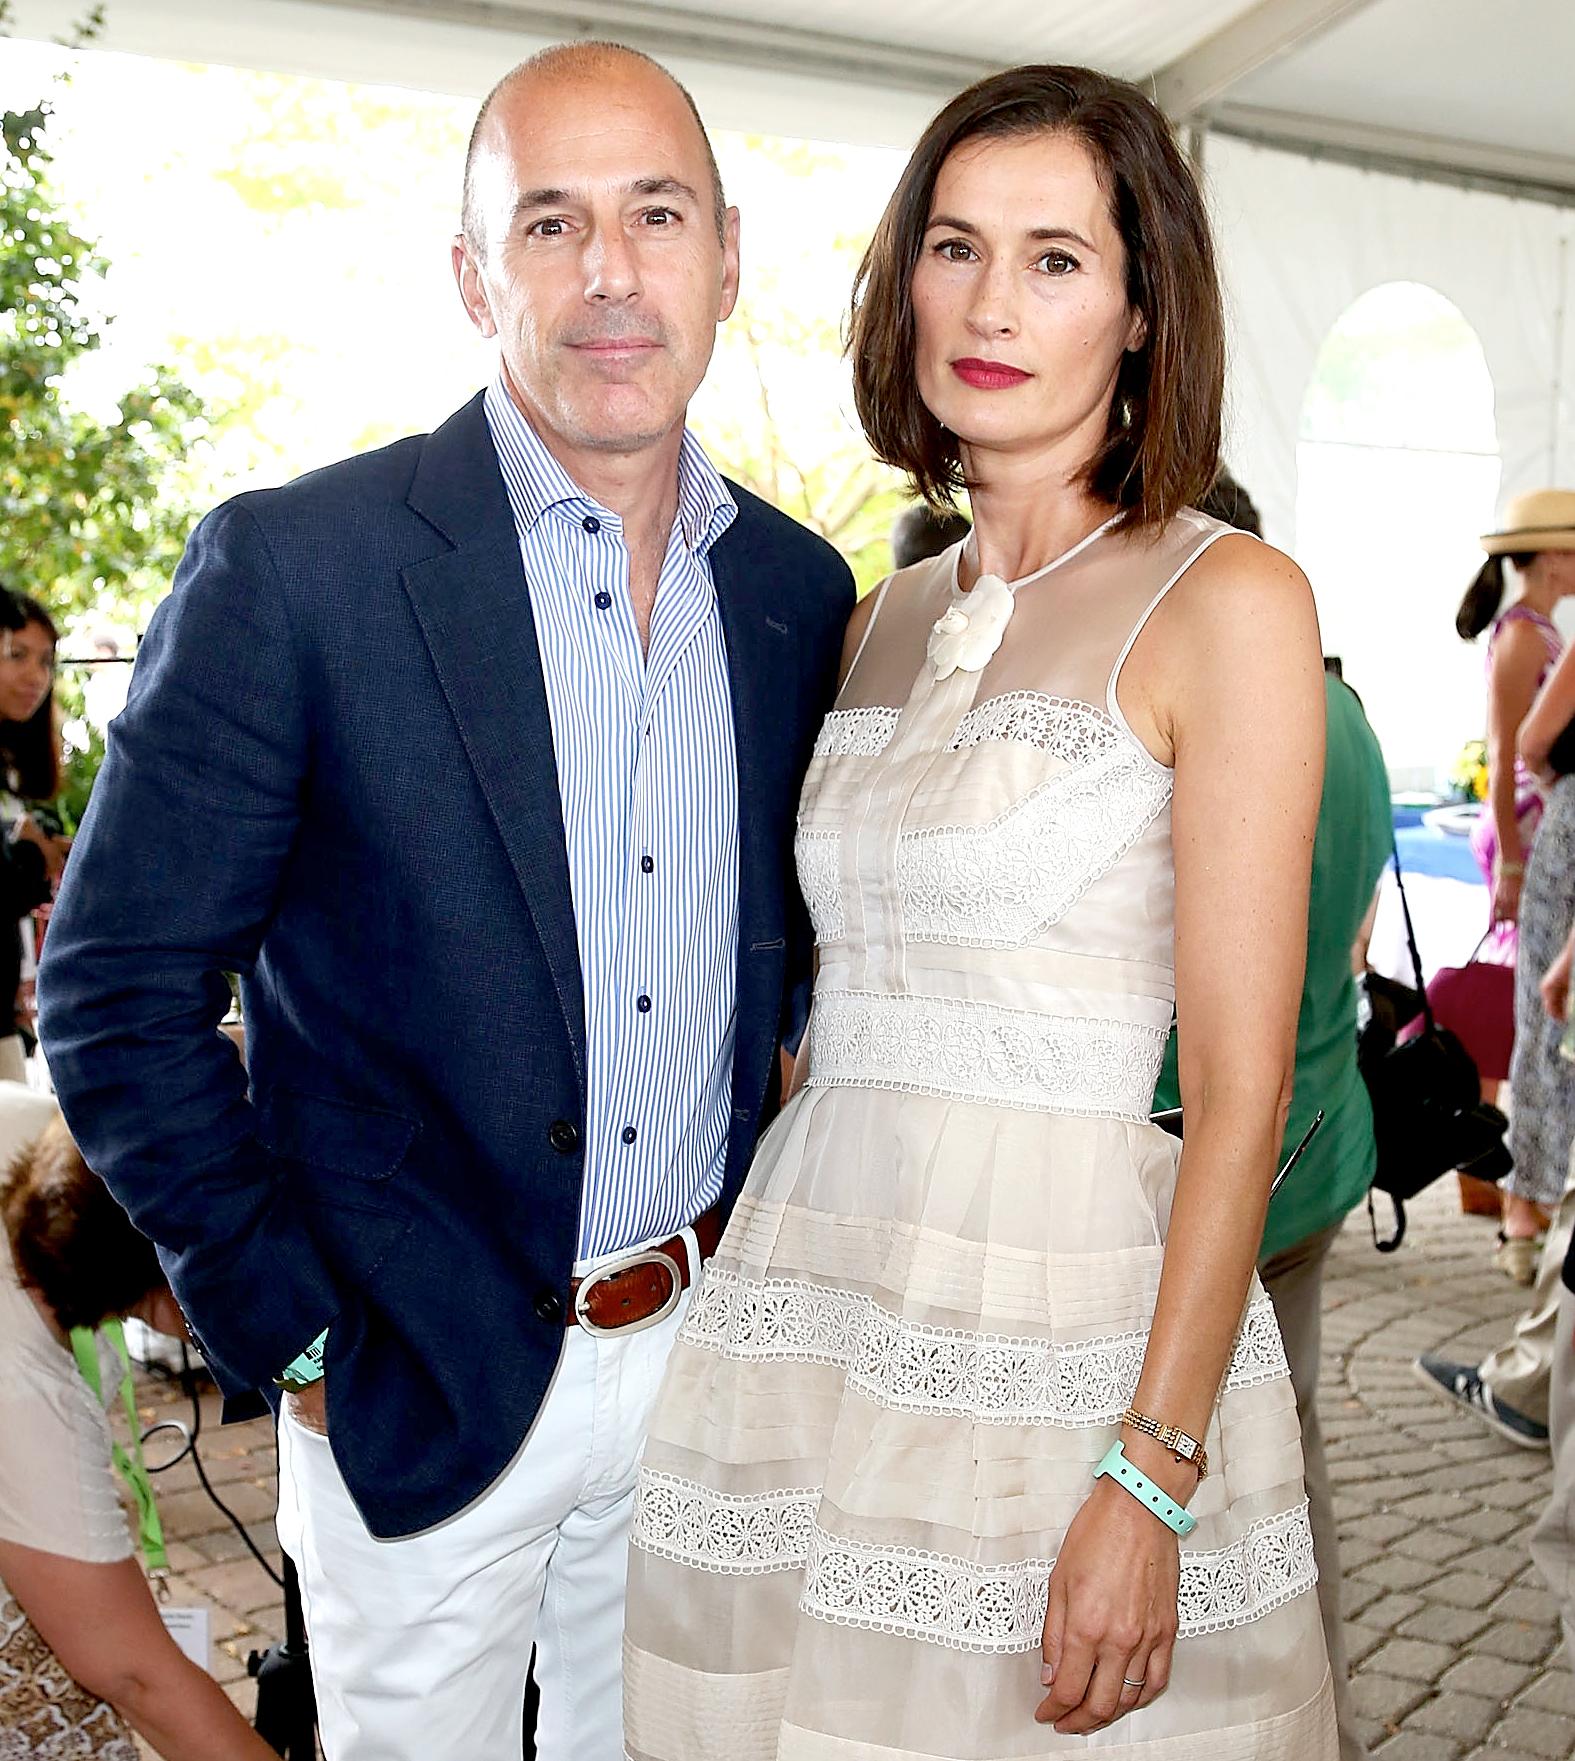 Matt--Lauer-and-Annette-Roque-divorce-finalized